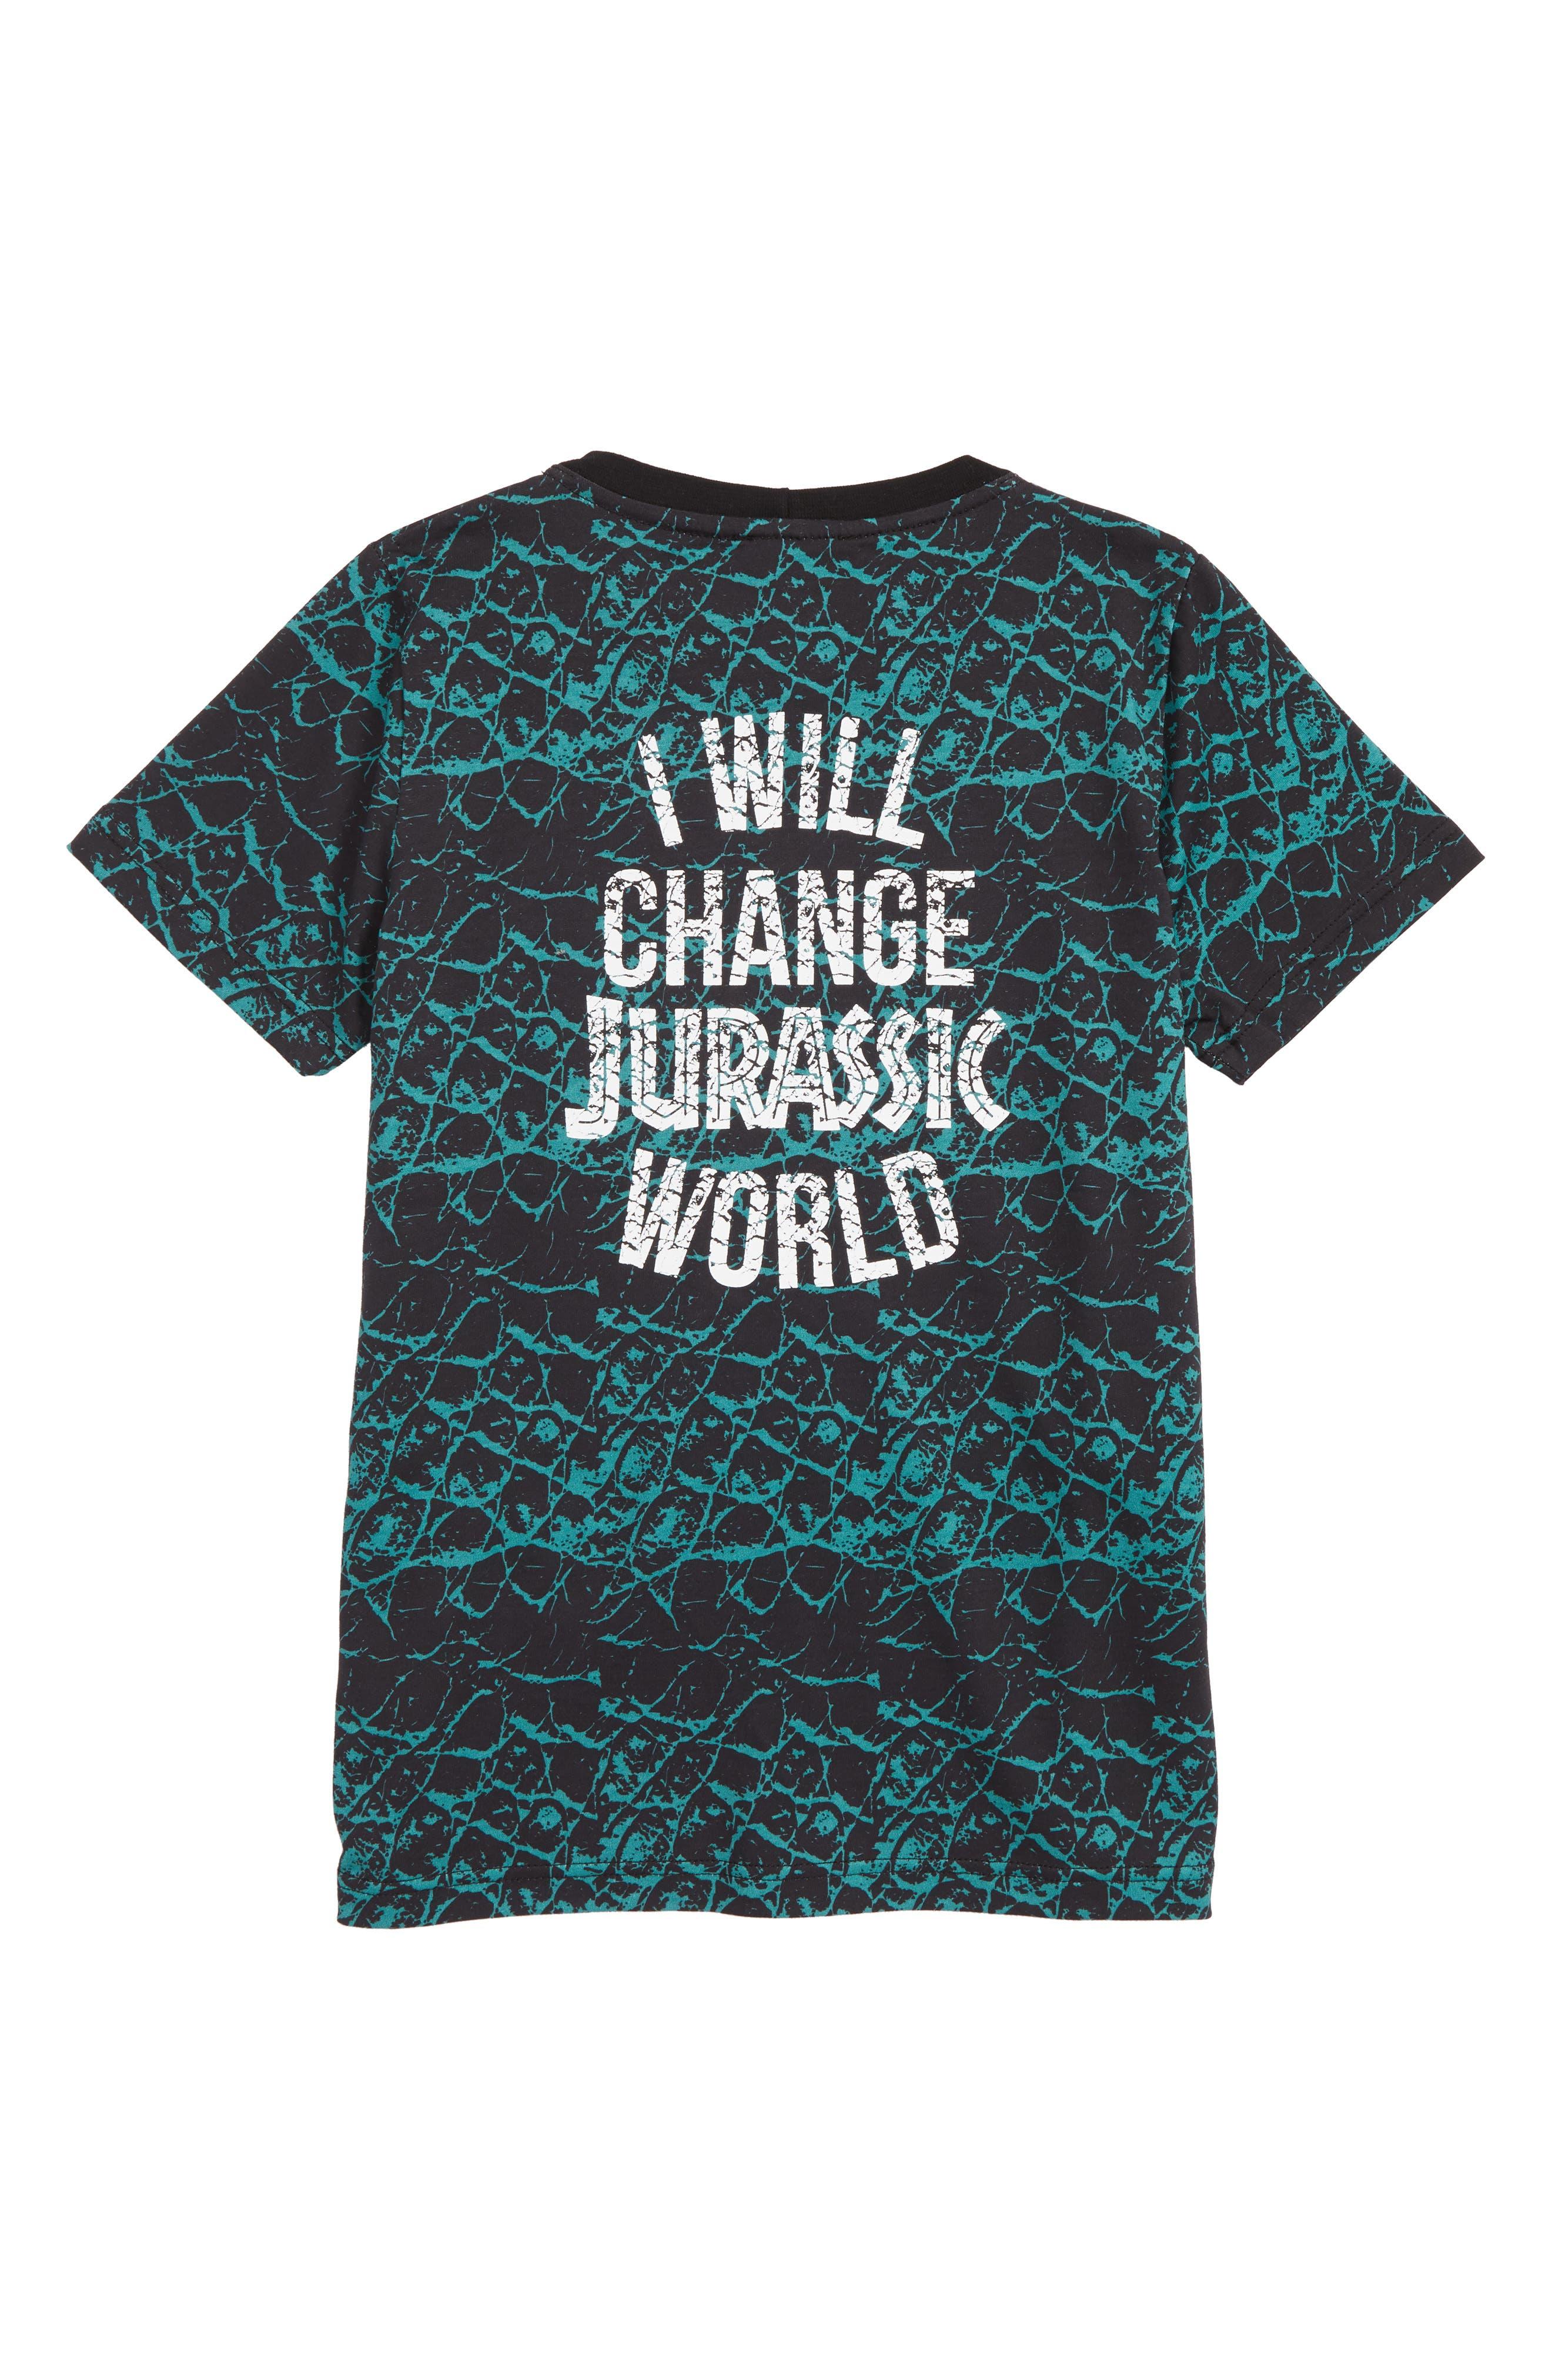 x Jurassic World Revolution Organic Cotton T-Shirt,                             Alternate thumbnail 2, color,                             001